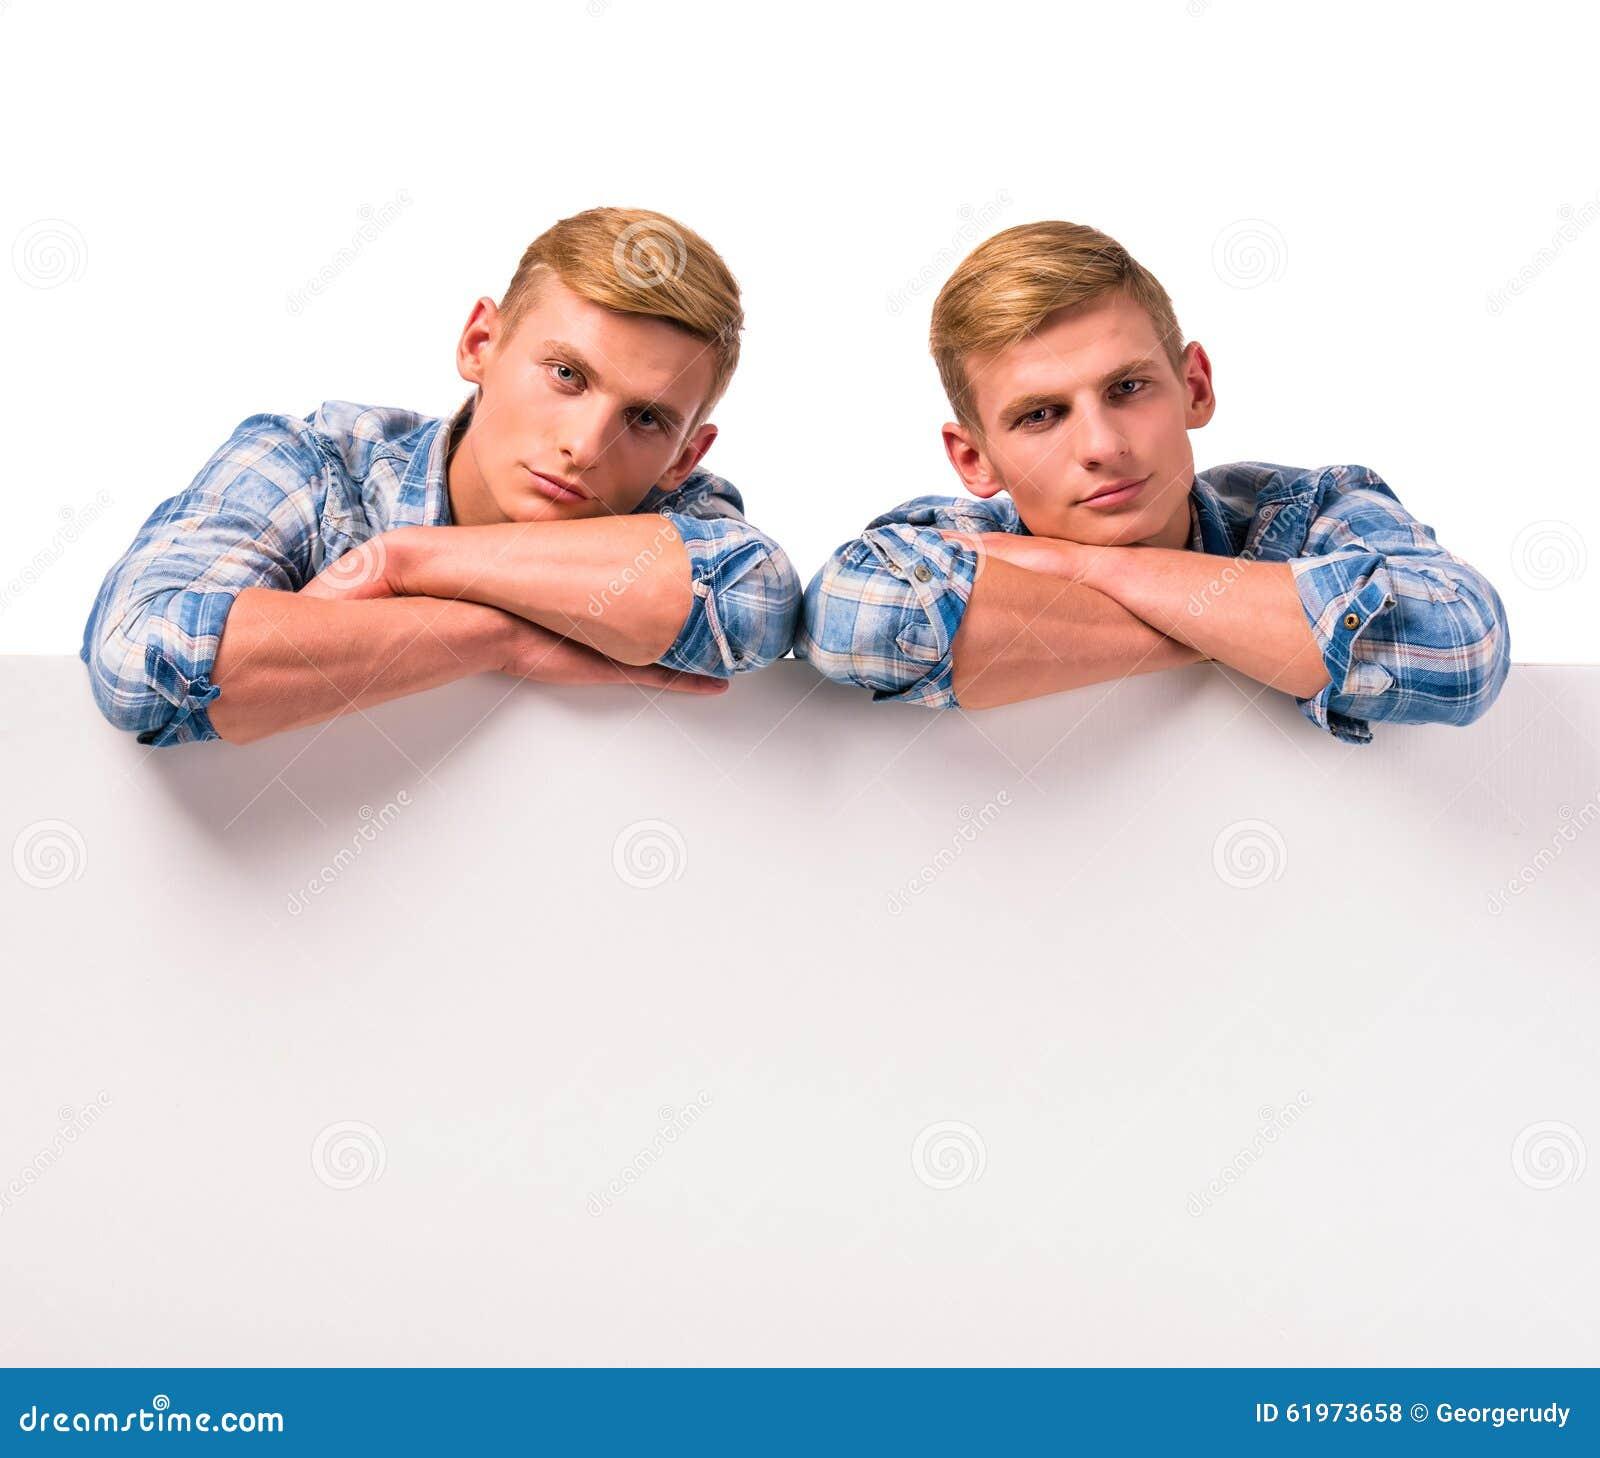 Zwei Doppeljungen